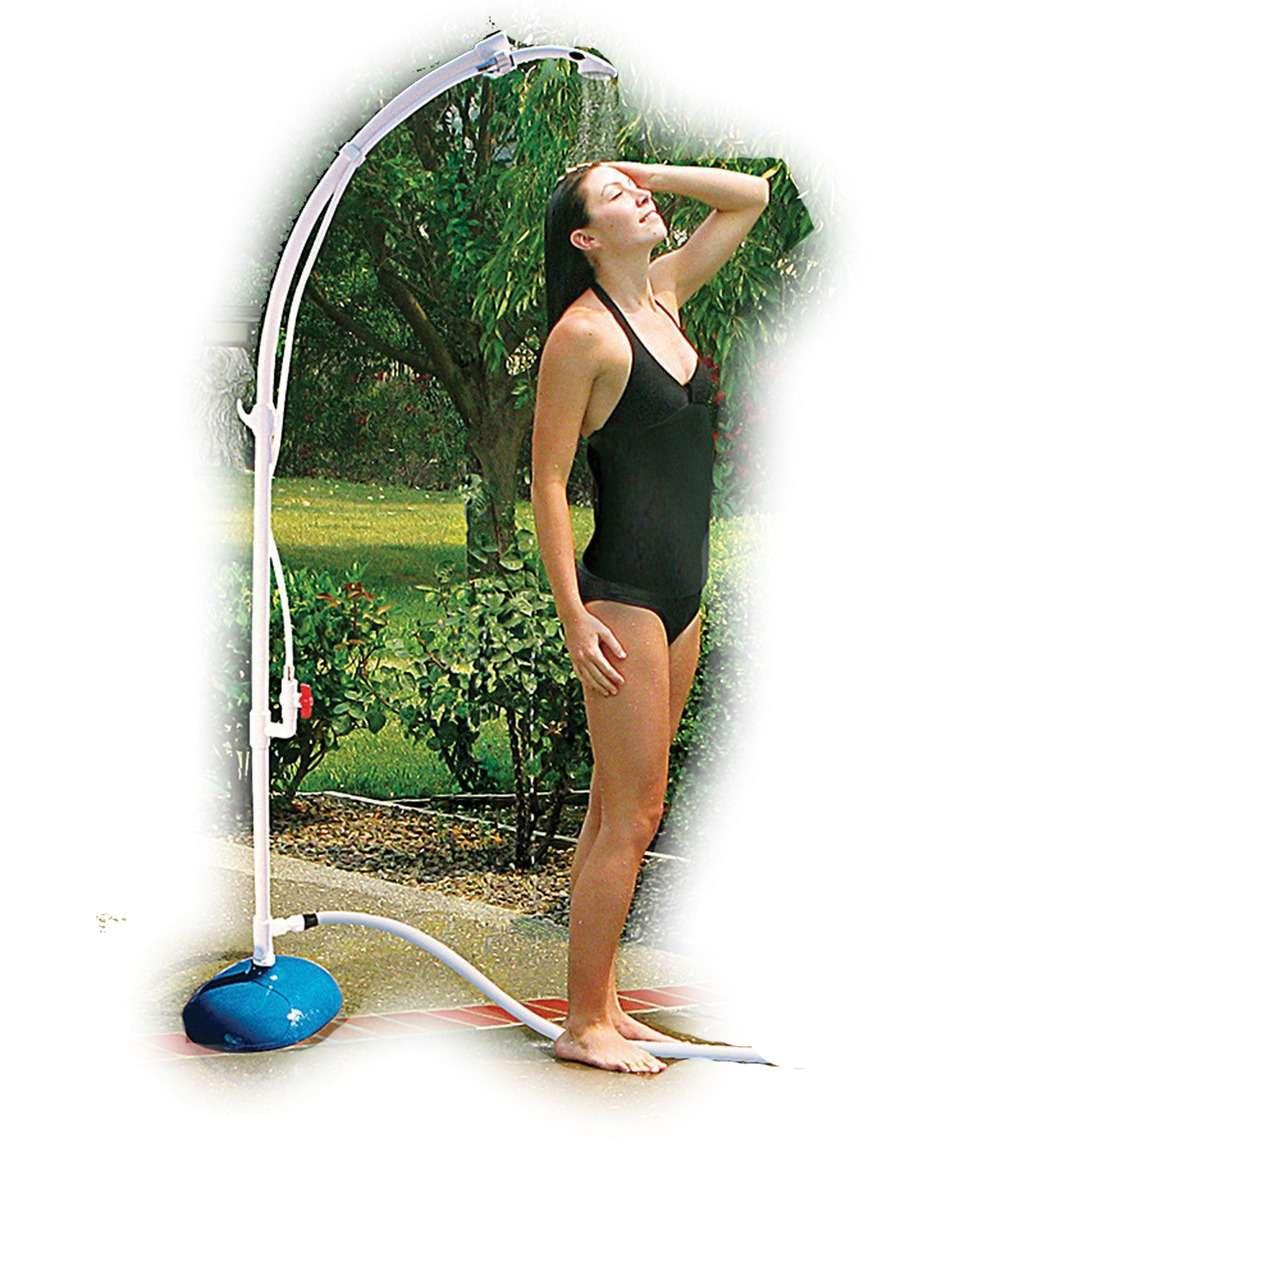 Duchas portatiles para jardin perfect ducha de piscina - Duchas portatiles camping ...